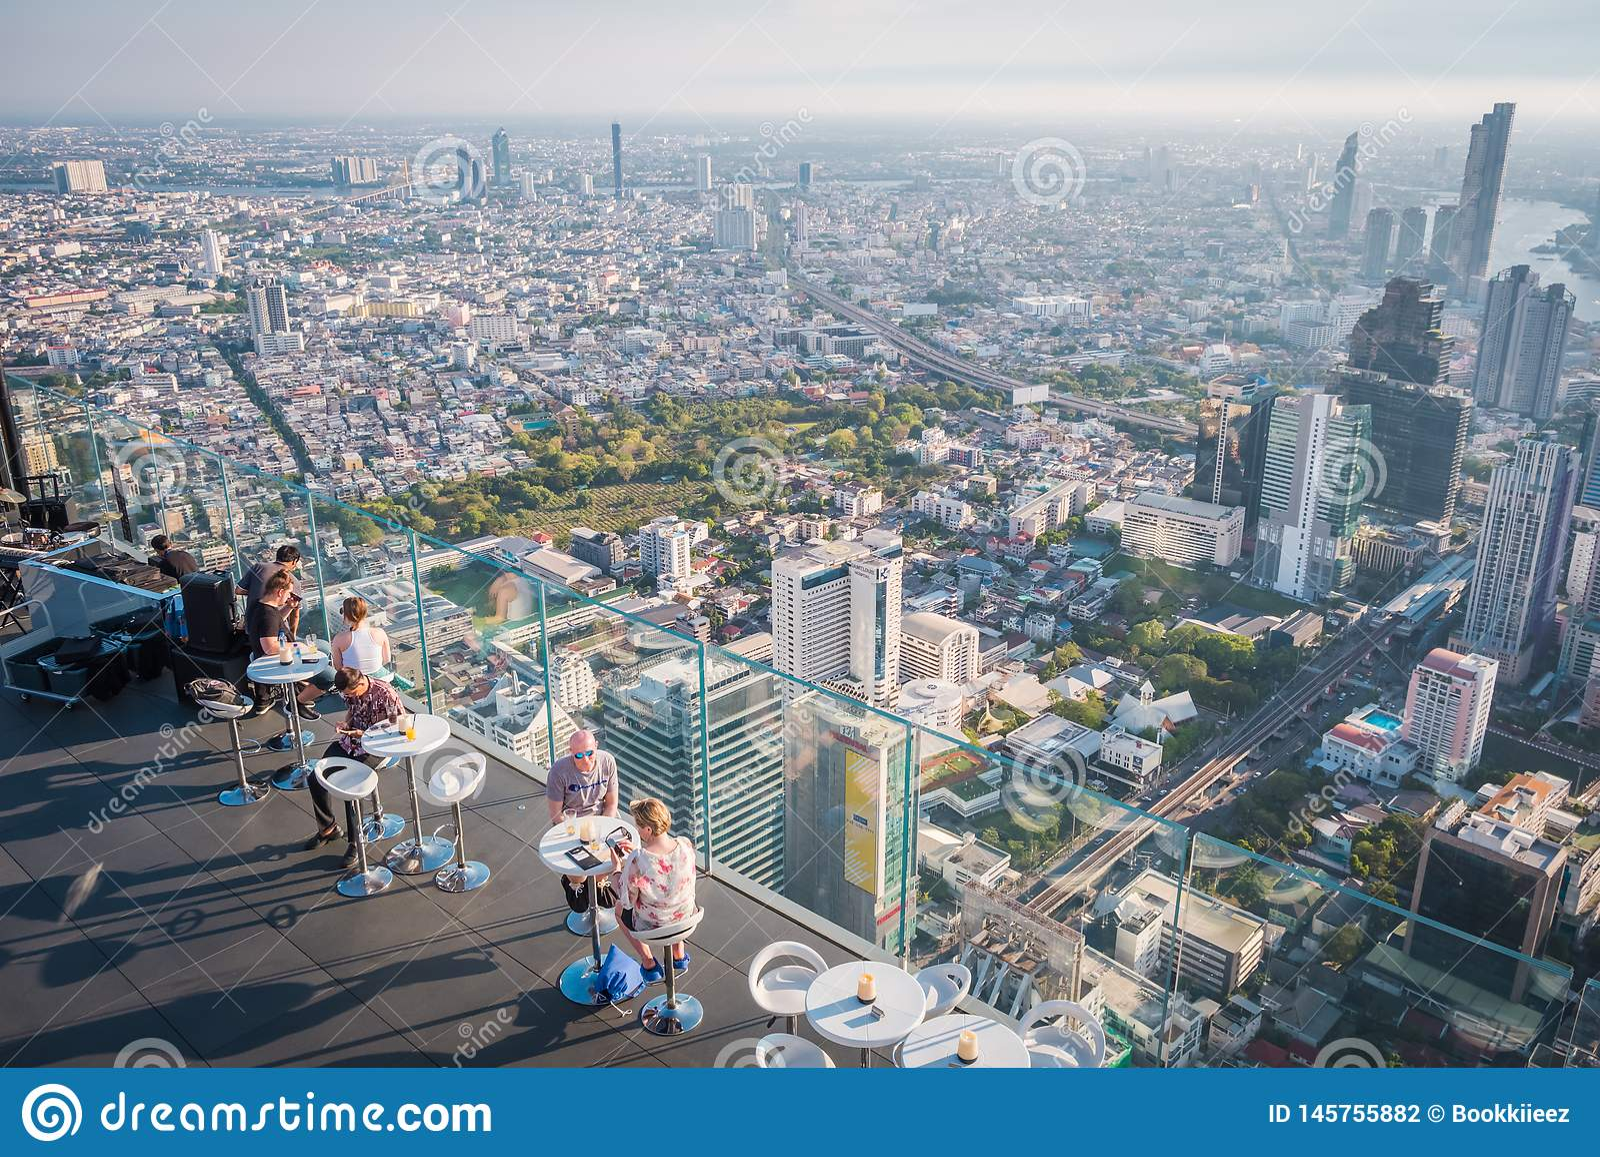 Touristes au Roi Power Mahanakorn Building au soixante-dix-huiti?me dessus de toit d ?tage ? Bangkok, Tha?lande